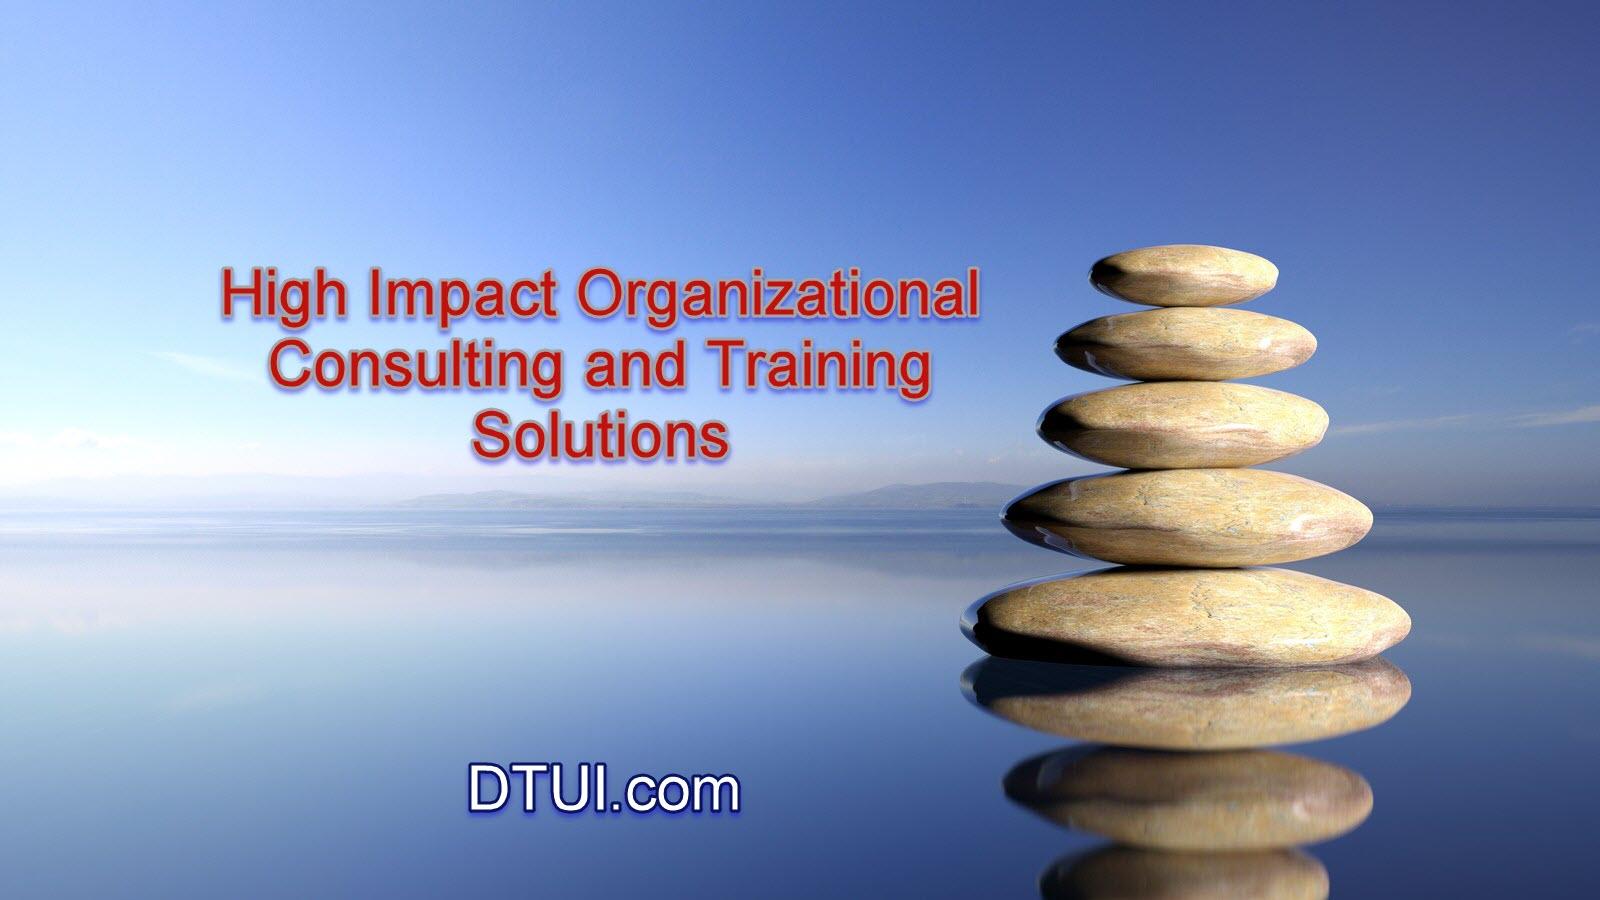 DTUI.com Services & Solutions